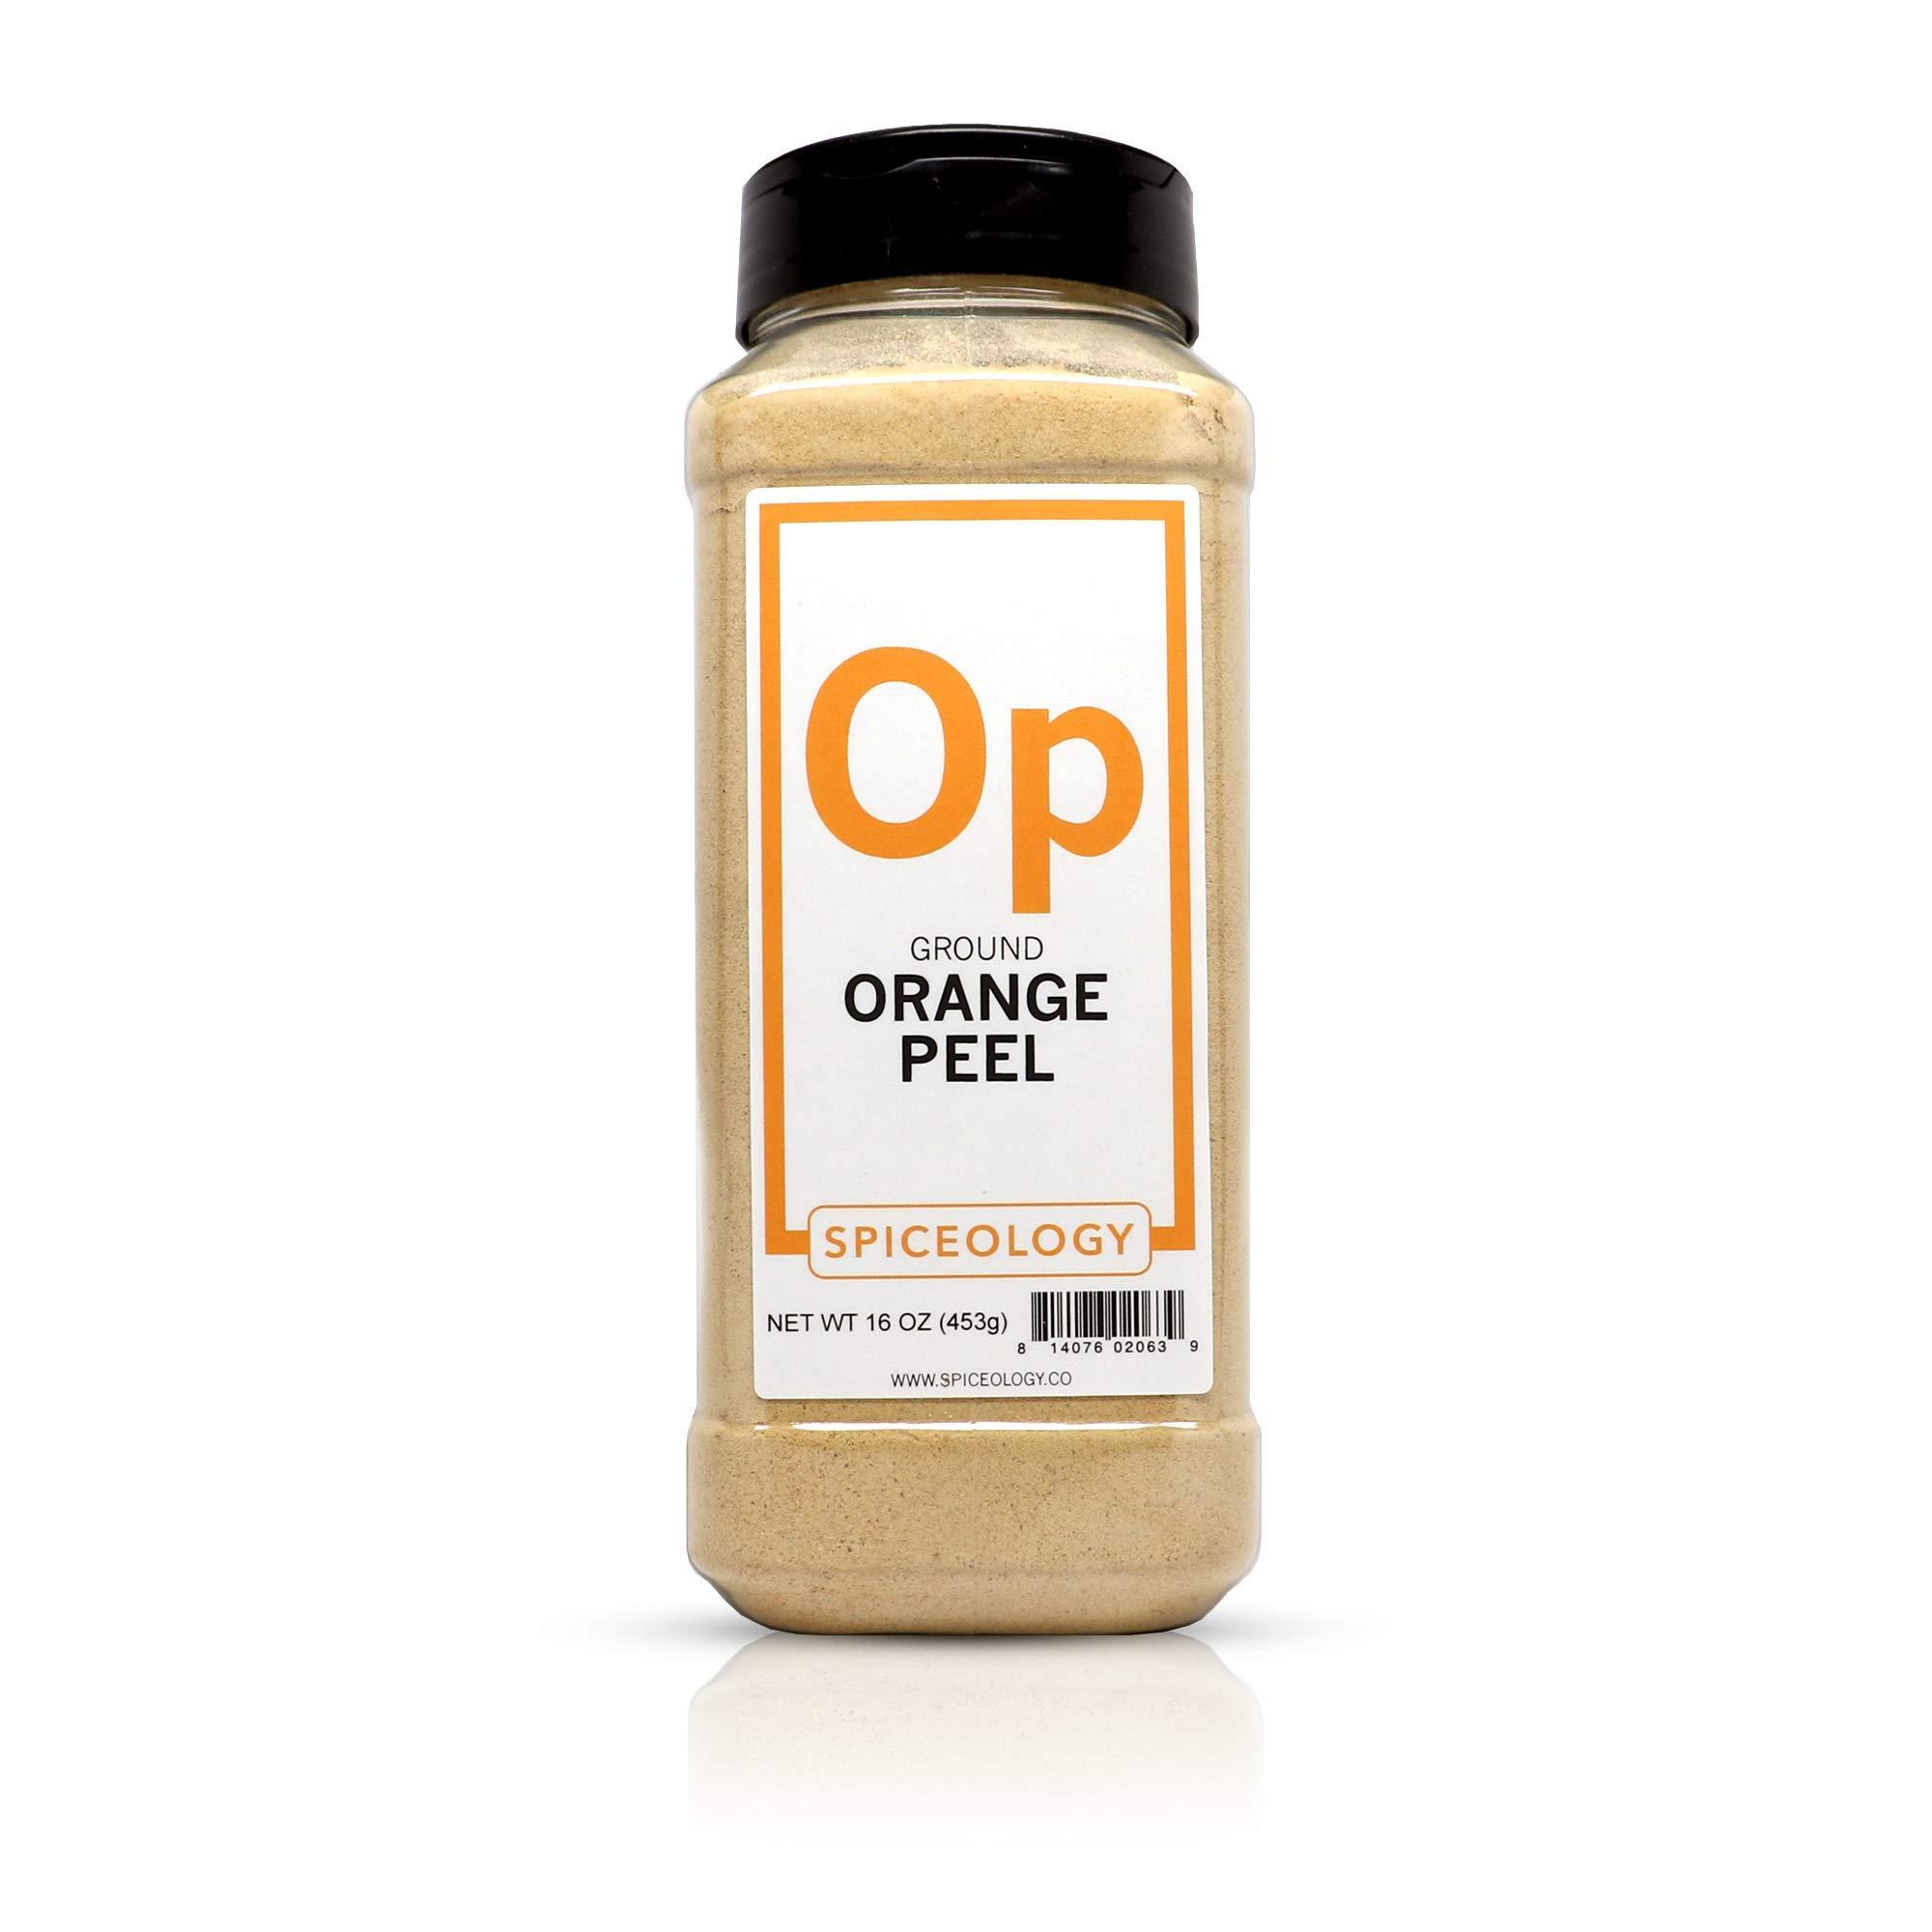 Orange Peel Powder - Spiceology Ground Orange Peel - 16 ounces